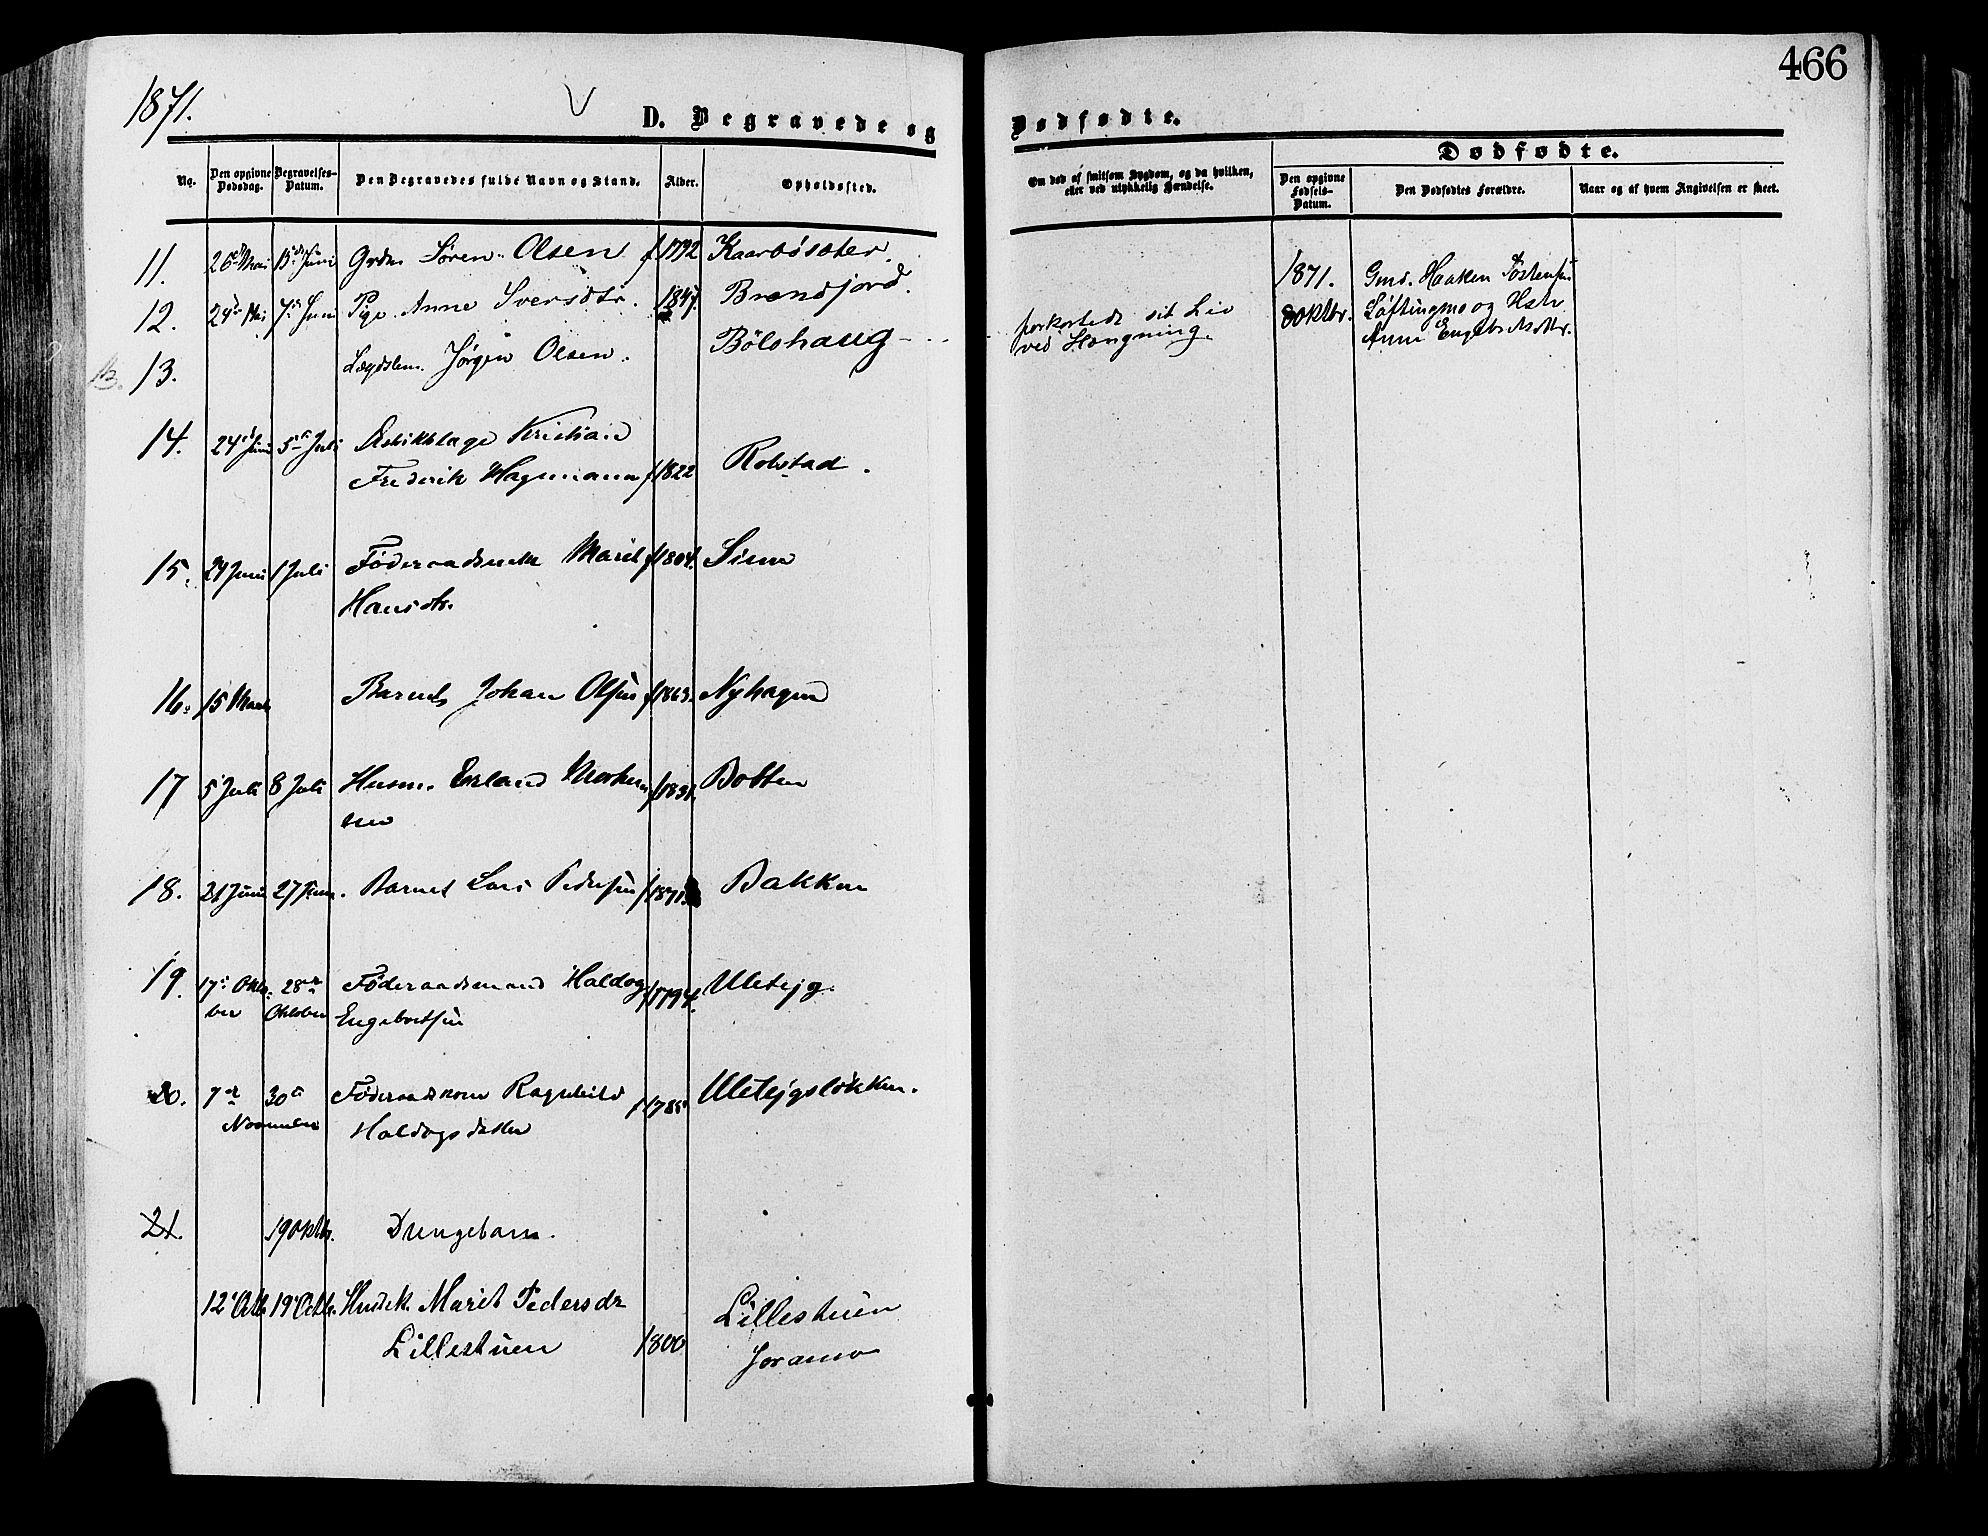 SAH, Lesja prestekontor, Ministerialbok nr. 8, 1854-1880, s. 466